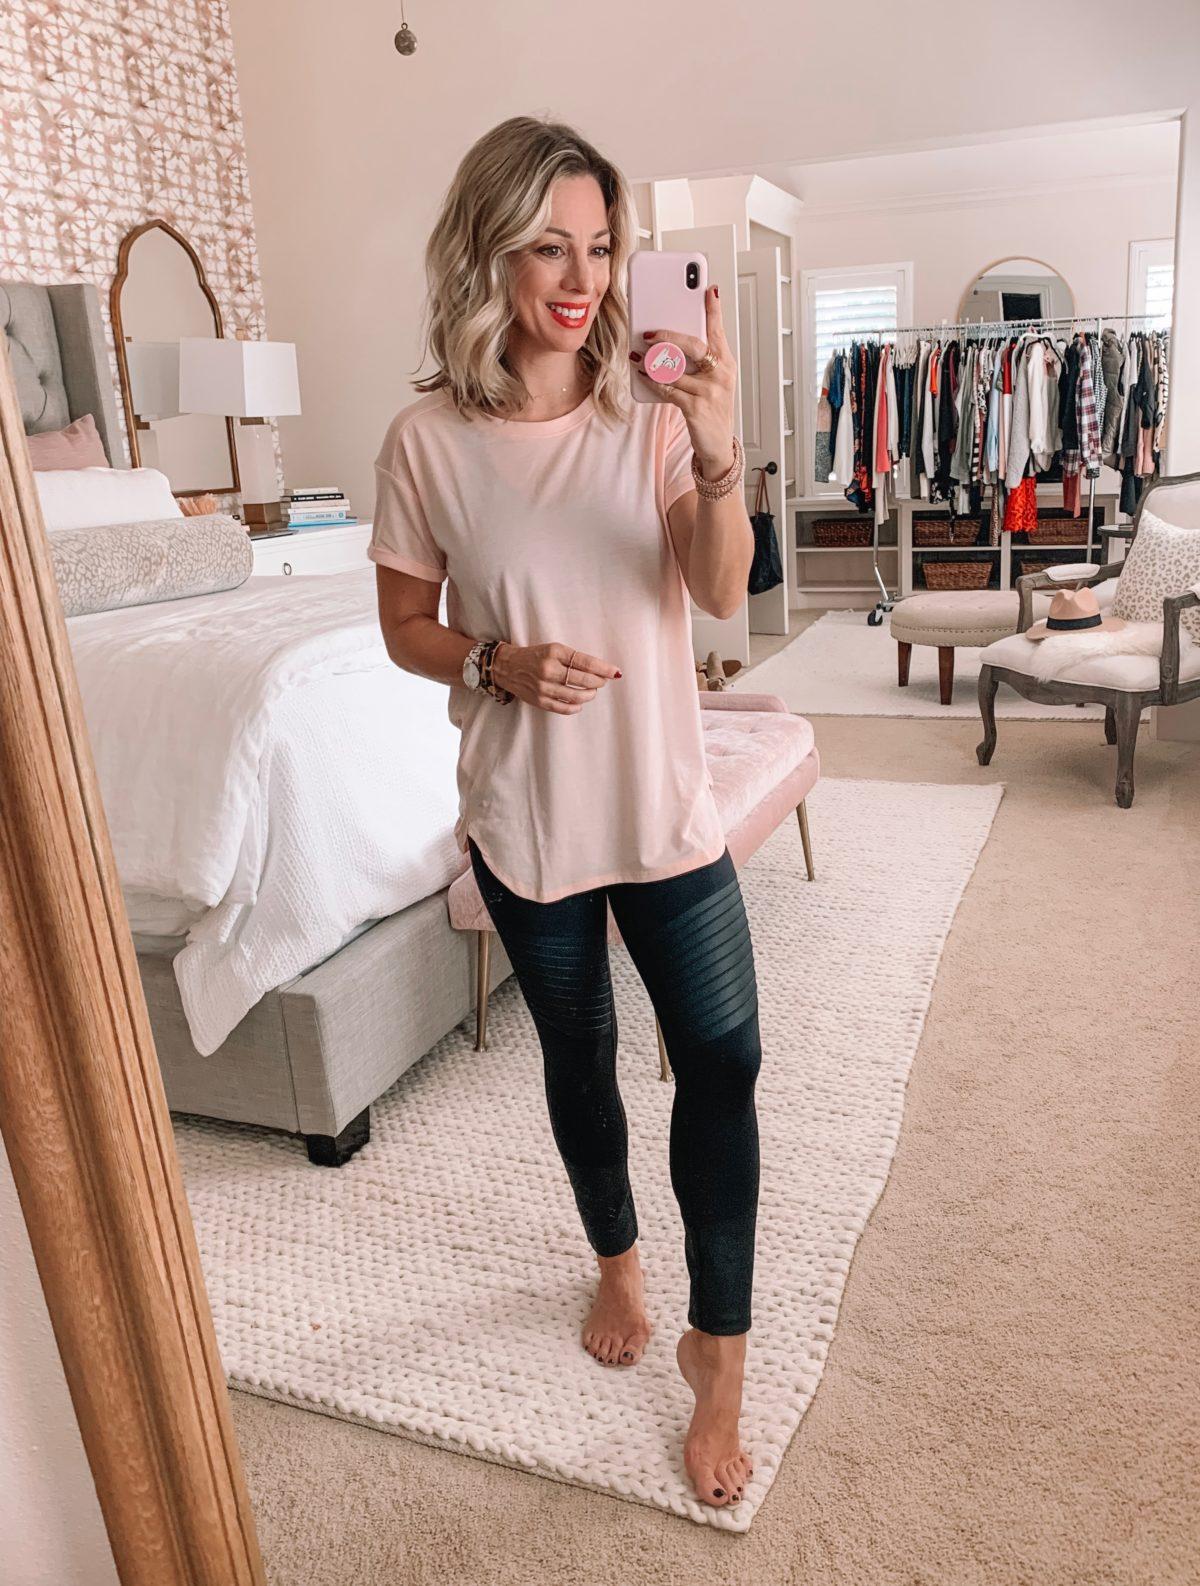 Amazon Prime Fashion- Tee and Leggings